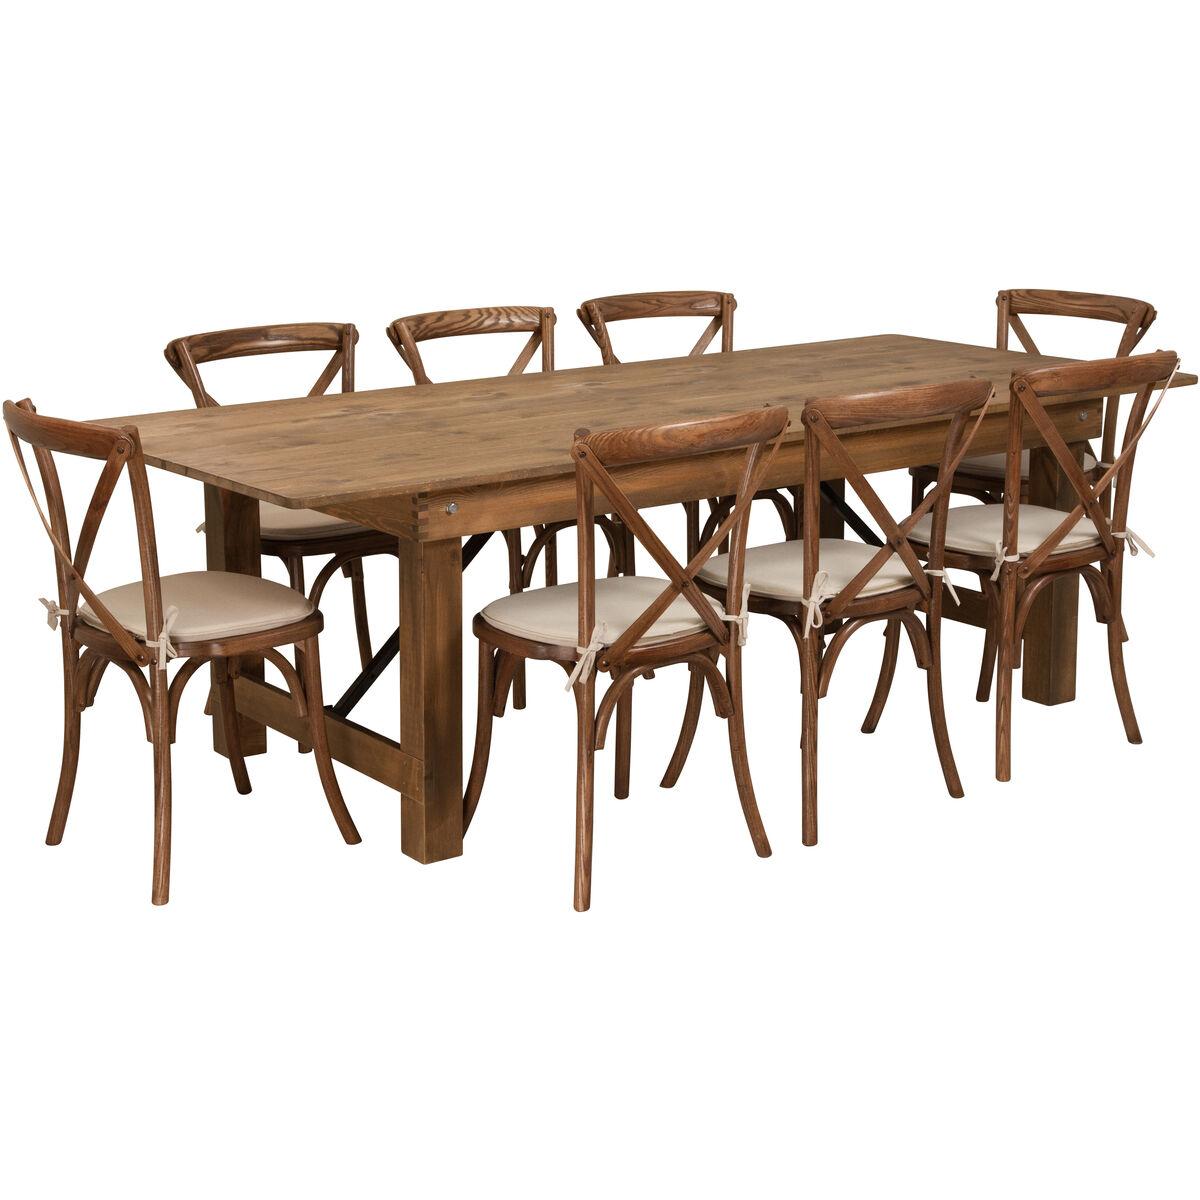 8 X40 Quot Farm Table 8 Chair Set Xa Farm 12 Gg